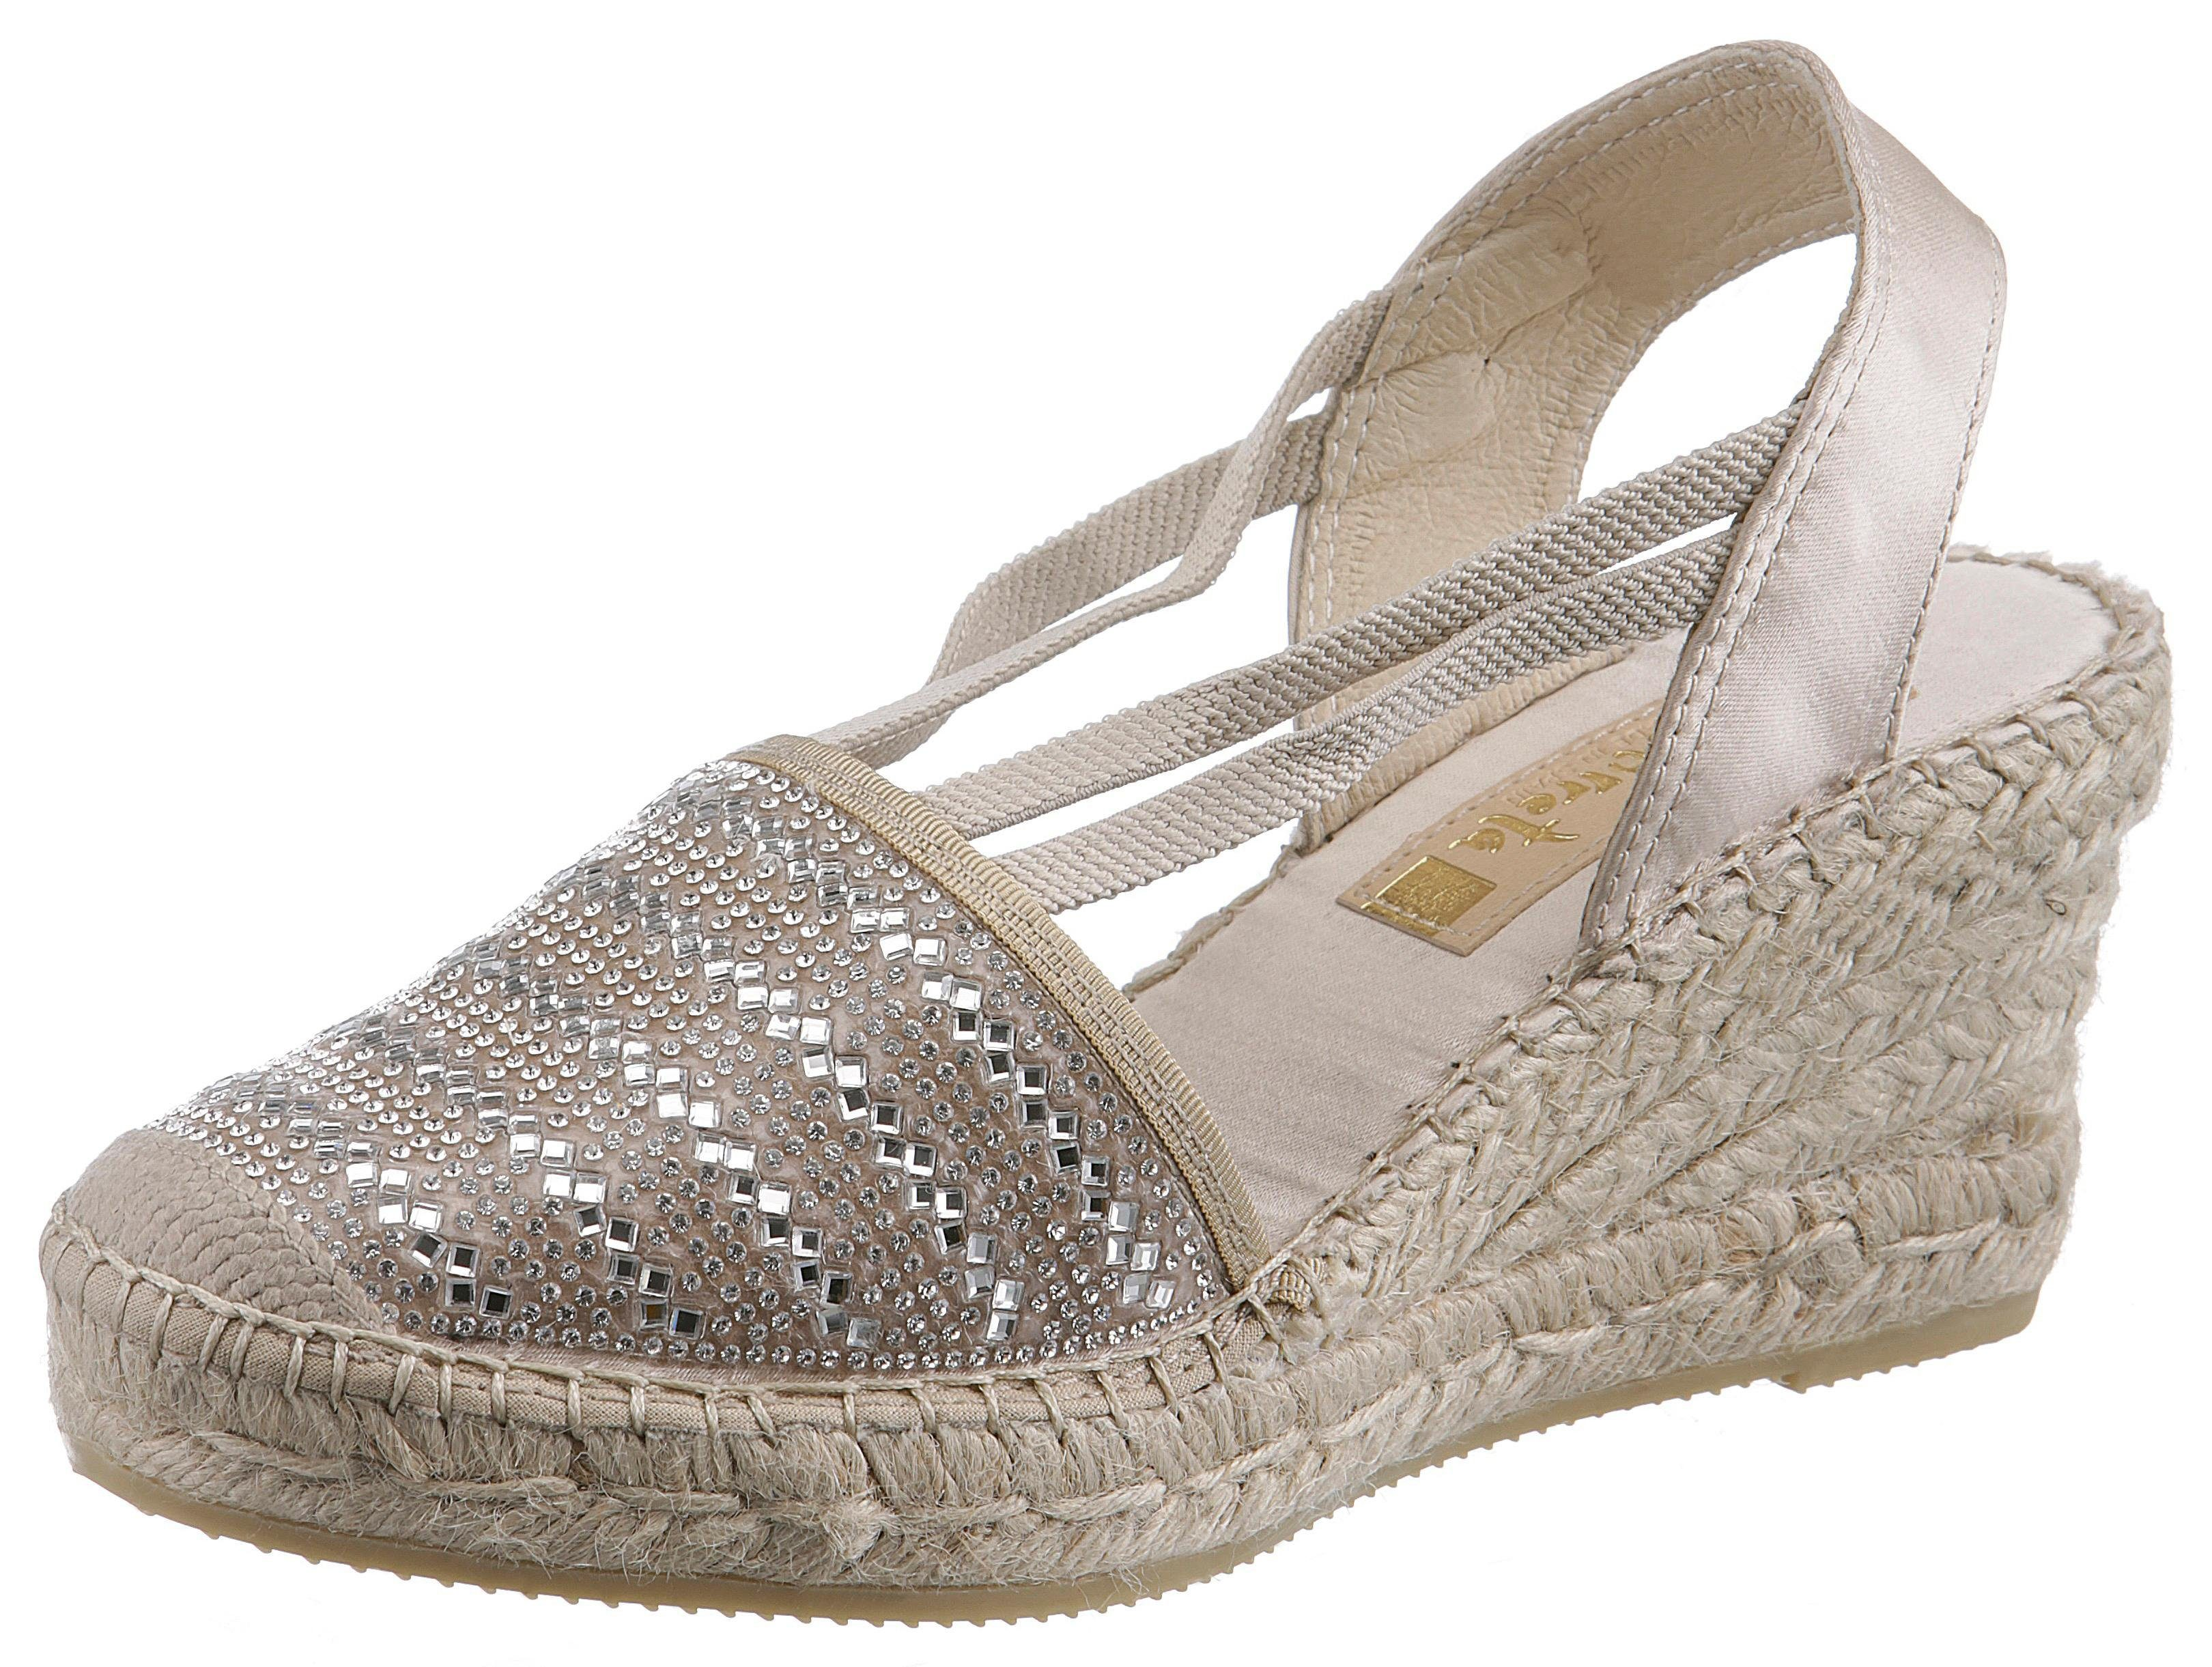 Vidorreta Sandalette, im trendigen Metallic-Look  beige-silberfarben